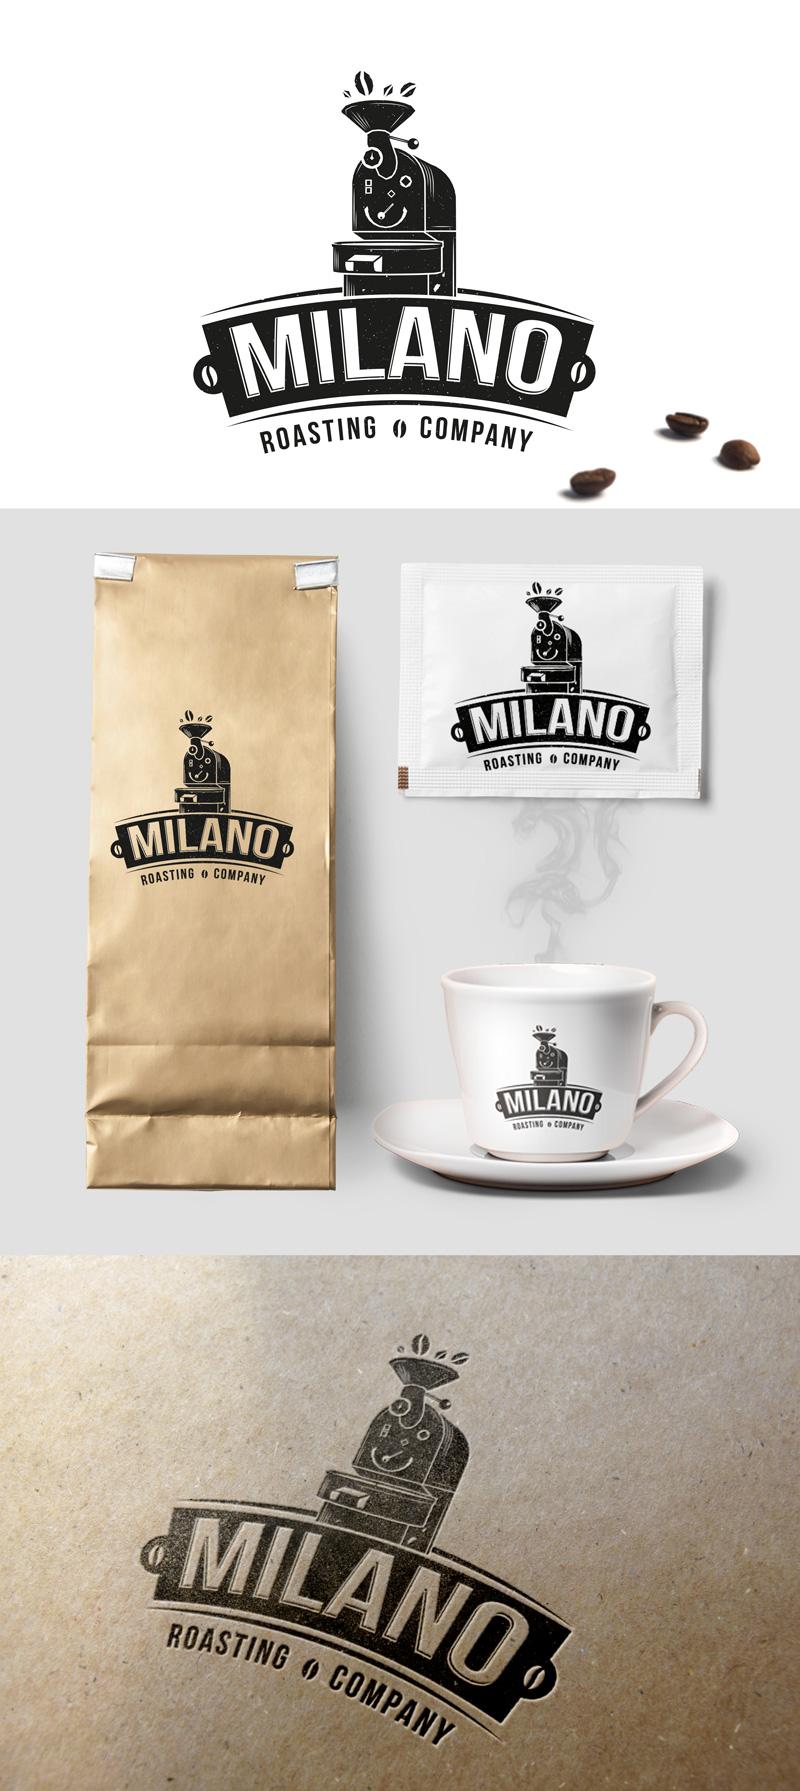 MILANO_roasting_logo_06.jpg